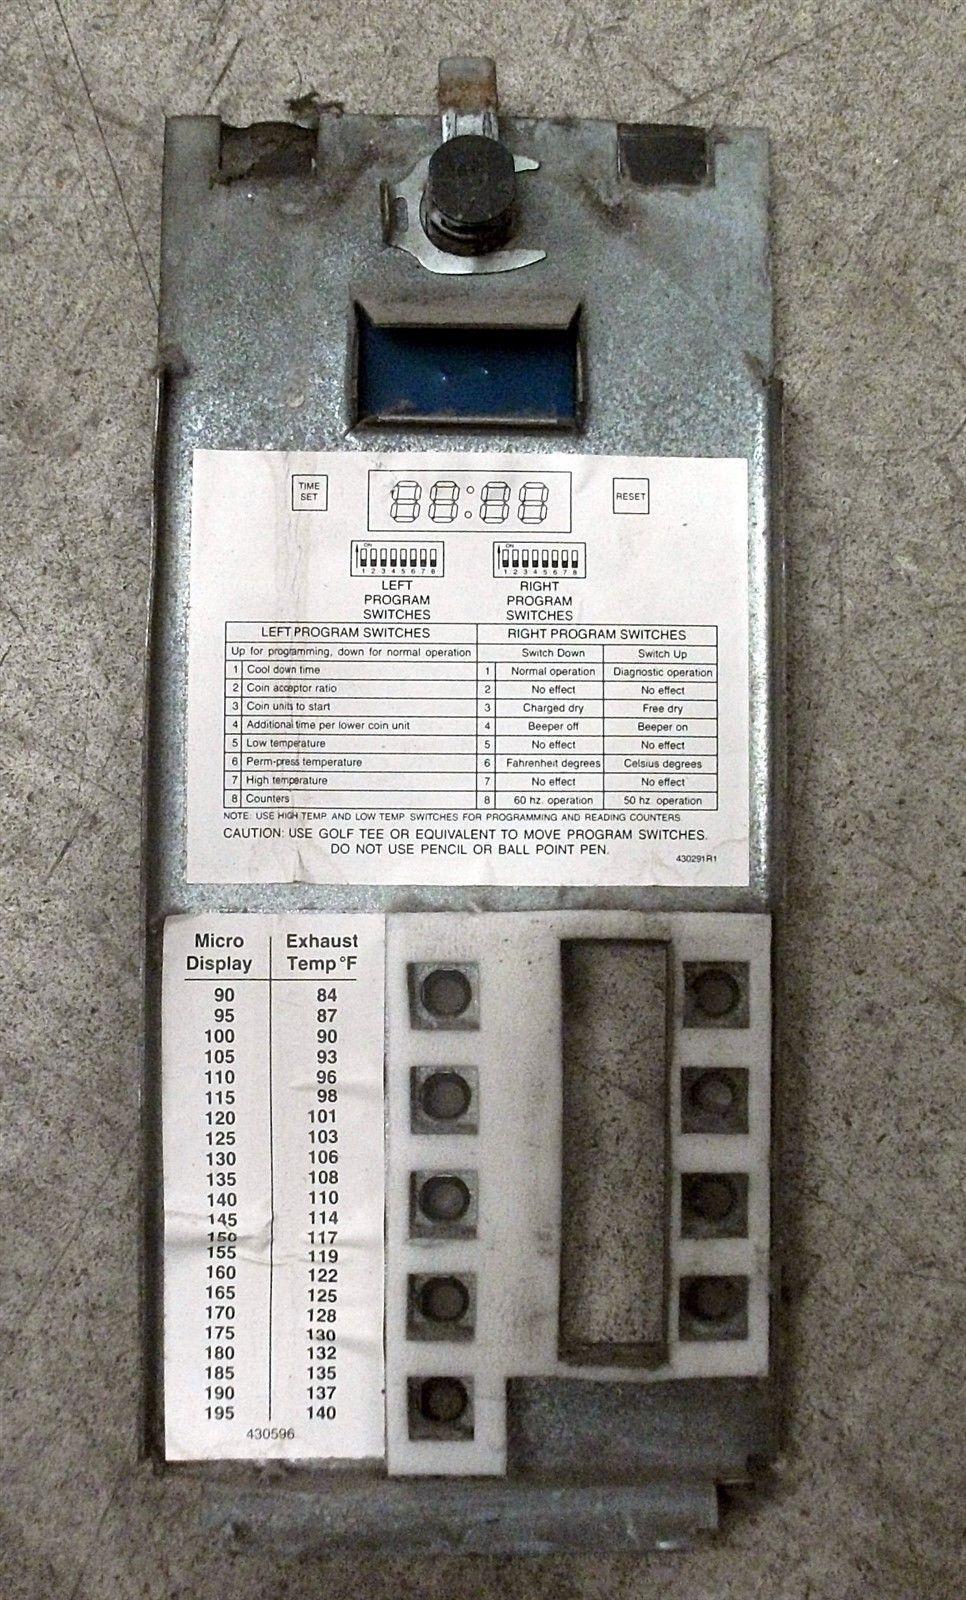 Wascomat Huebsch Speed Queen Lower Dryer Control Faceplate Model scd32dg